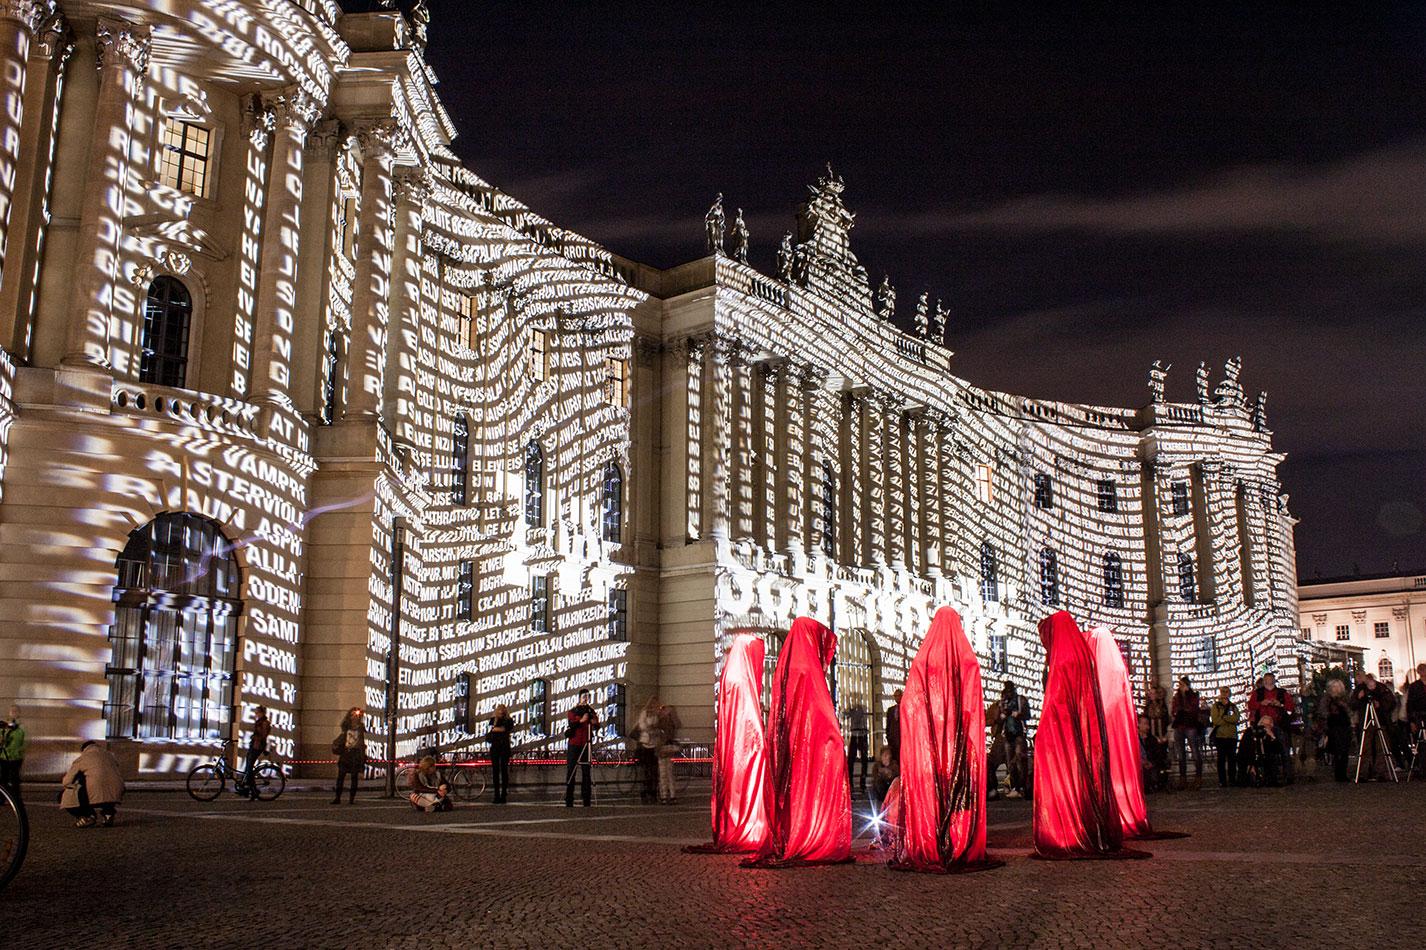 festival-of-lights-berlin-humboldt-university-light-art-show-exhibition-lumina-guardians-of-time-manfred-kili-kielnhofer-contemporary-arts-design-sculpture-3426